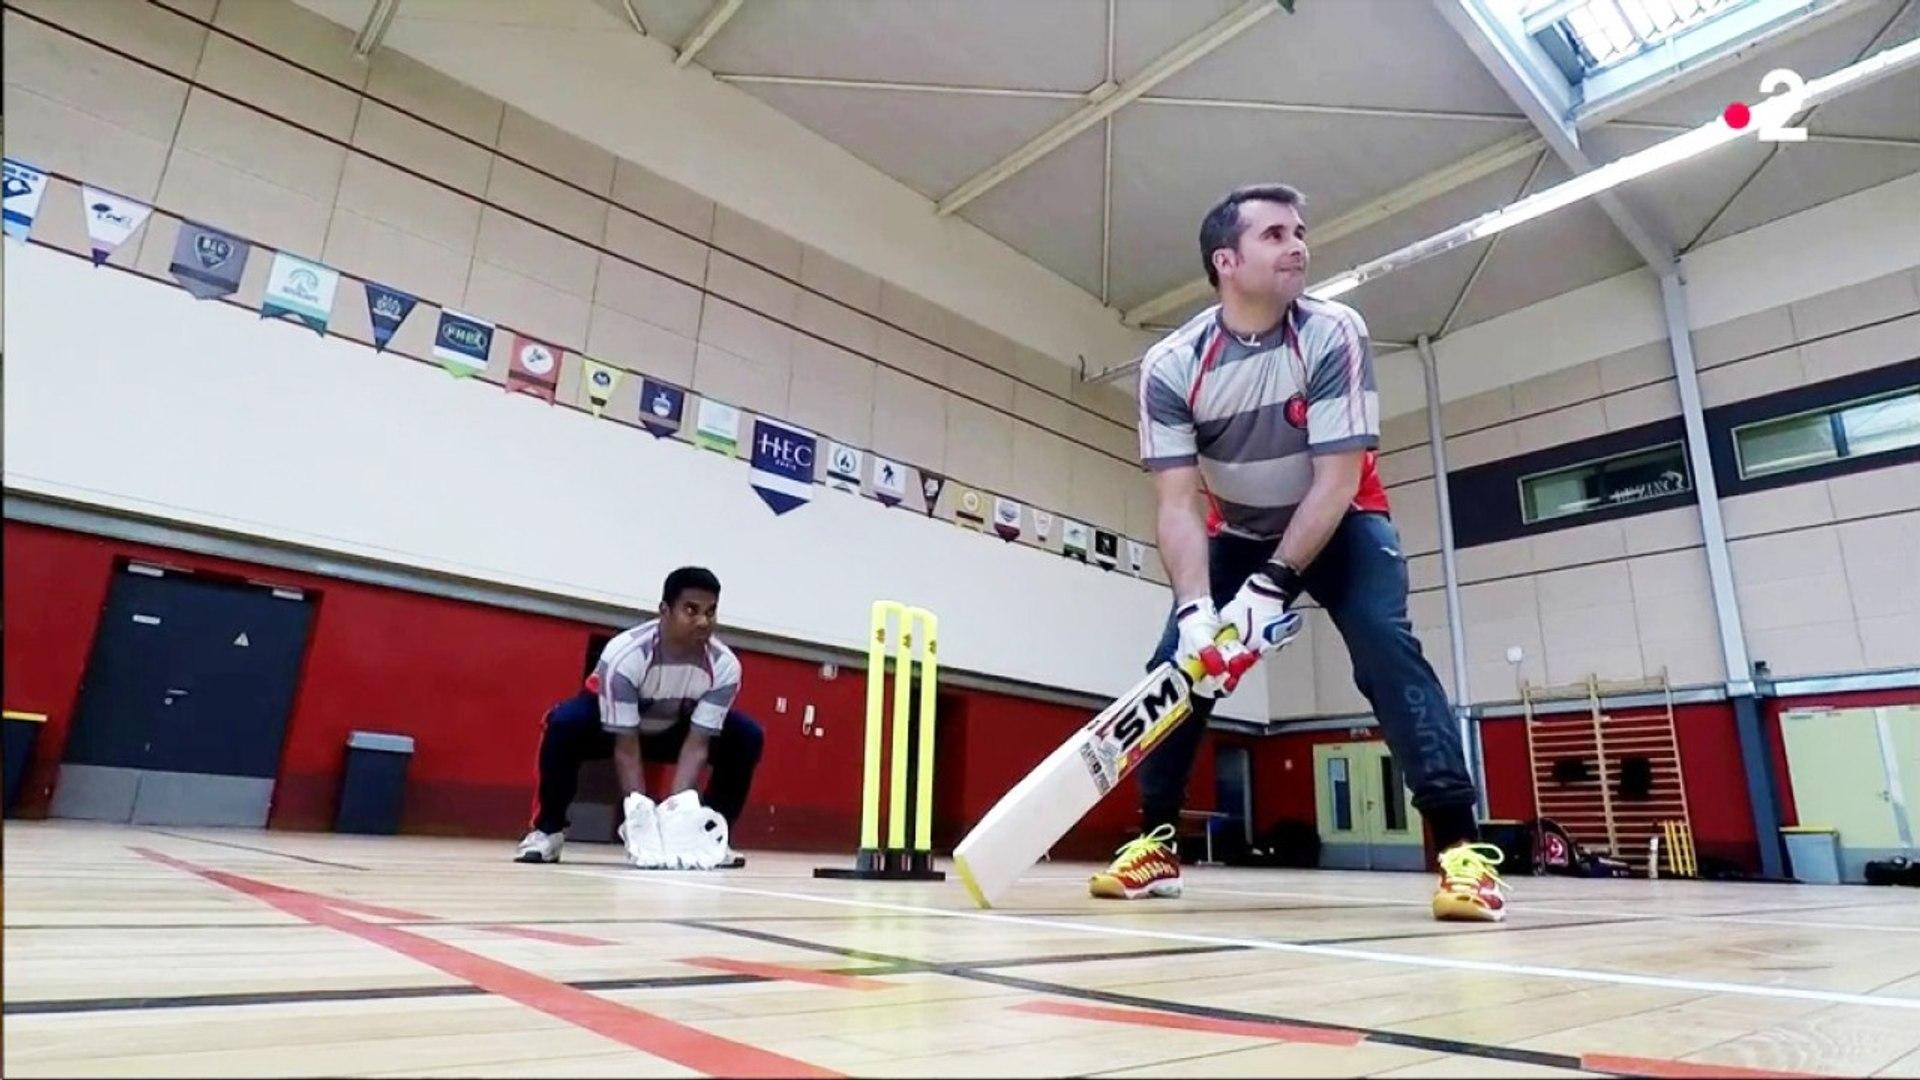 Sport - Le cricket : un sport « so british »